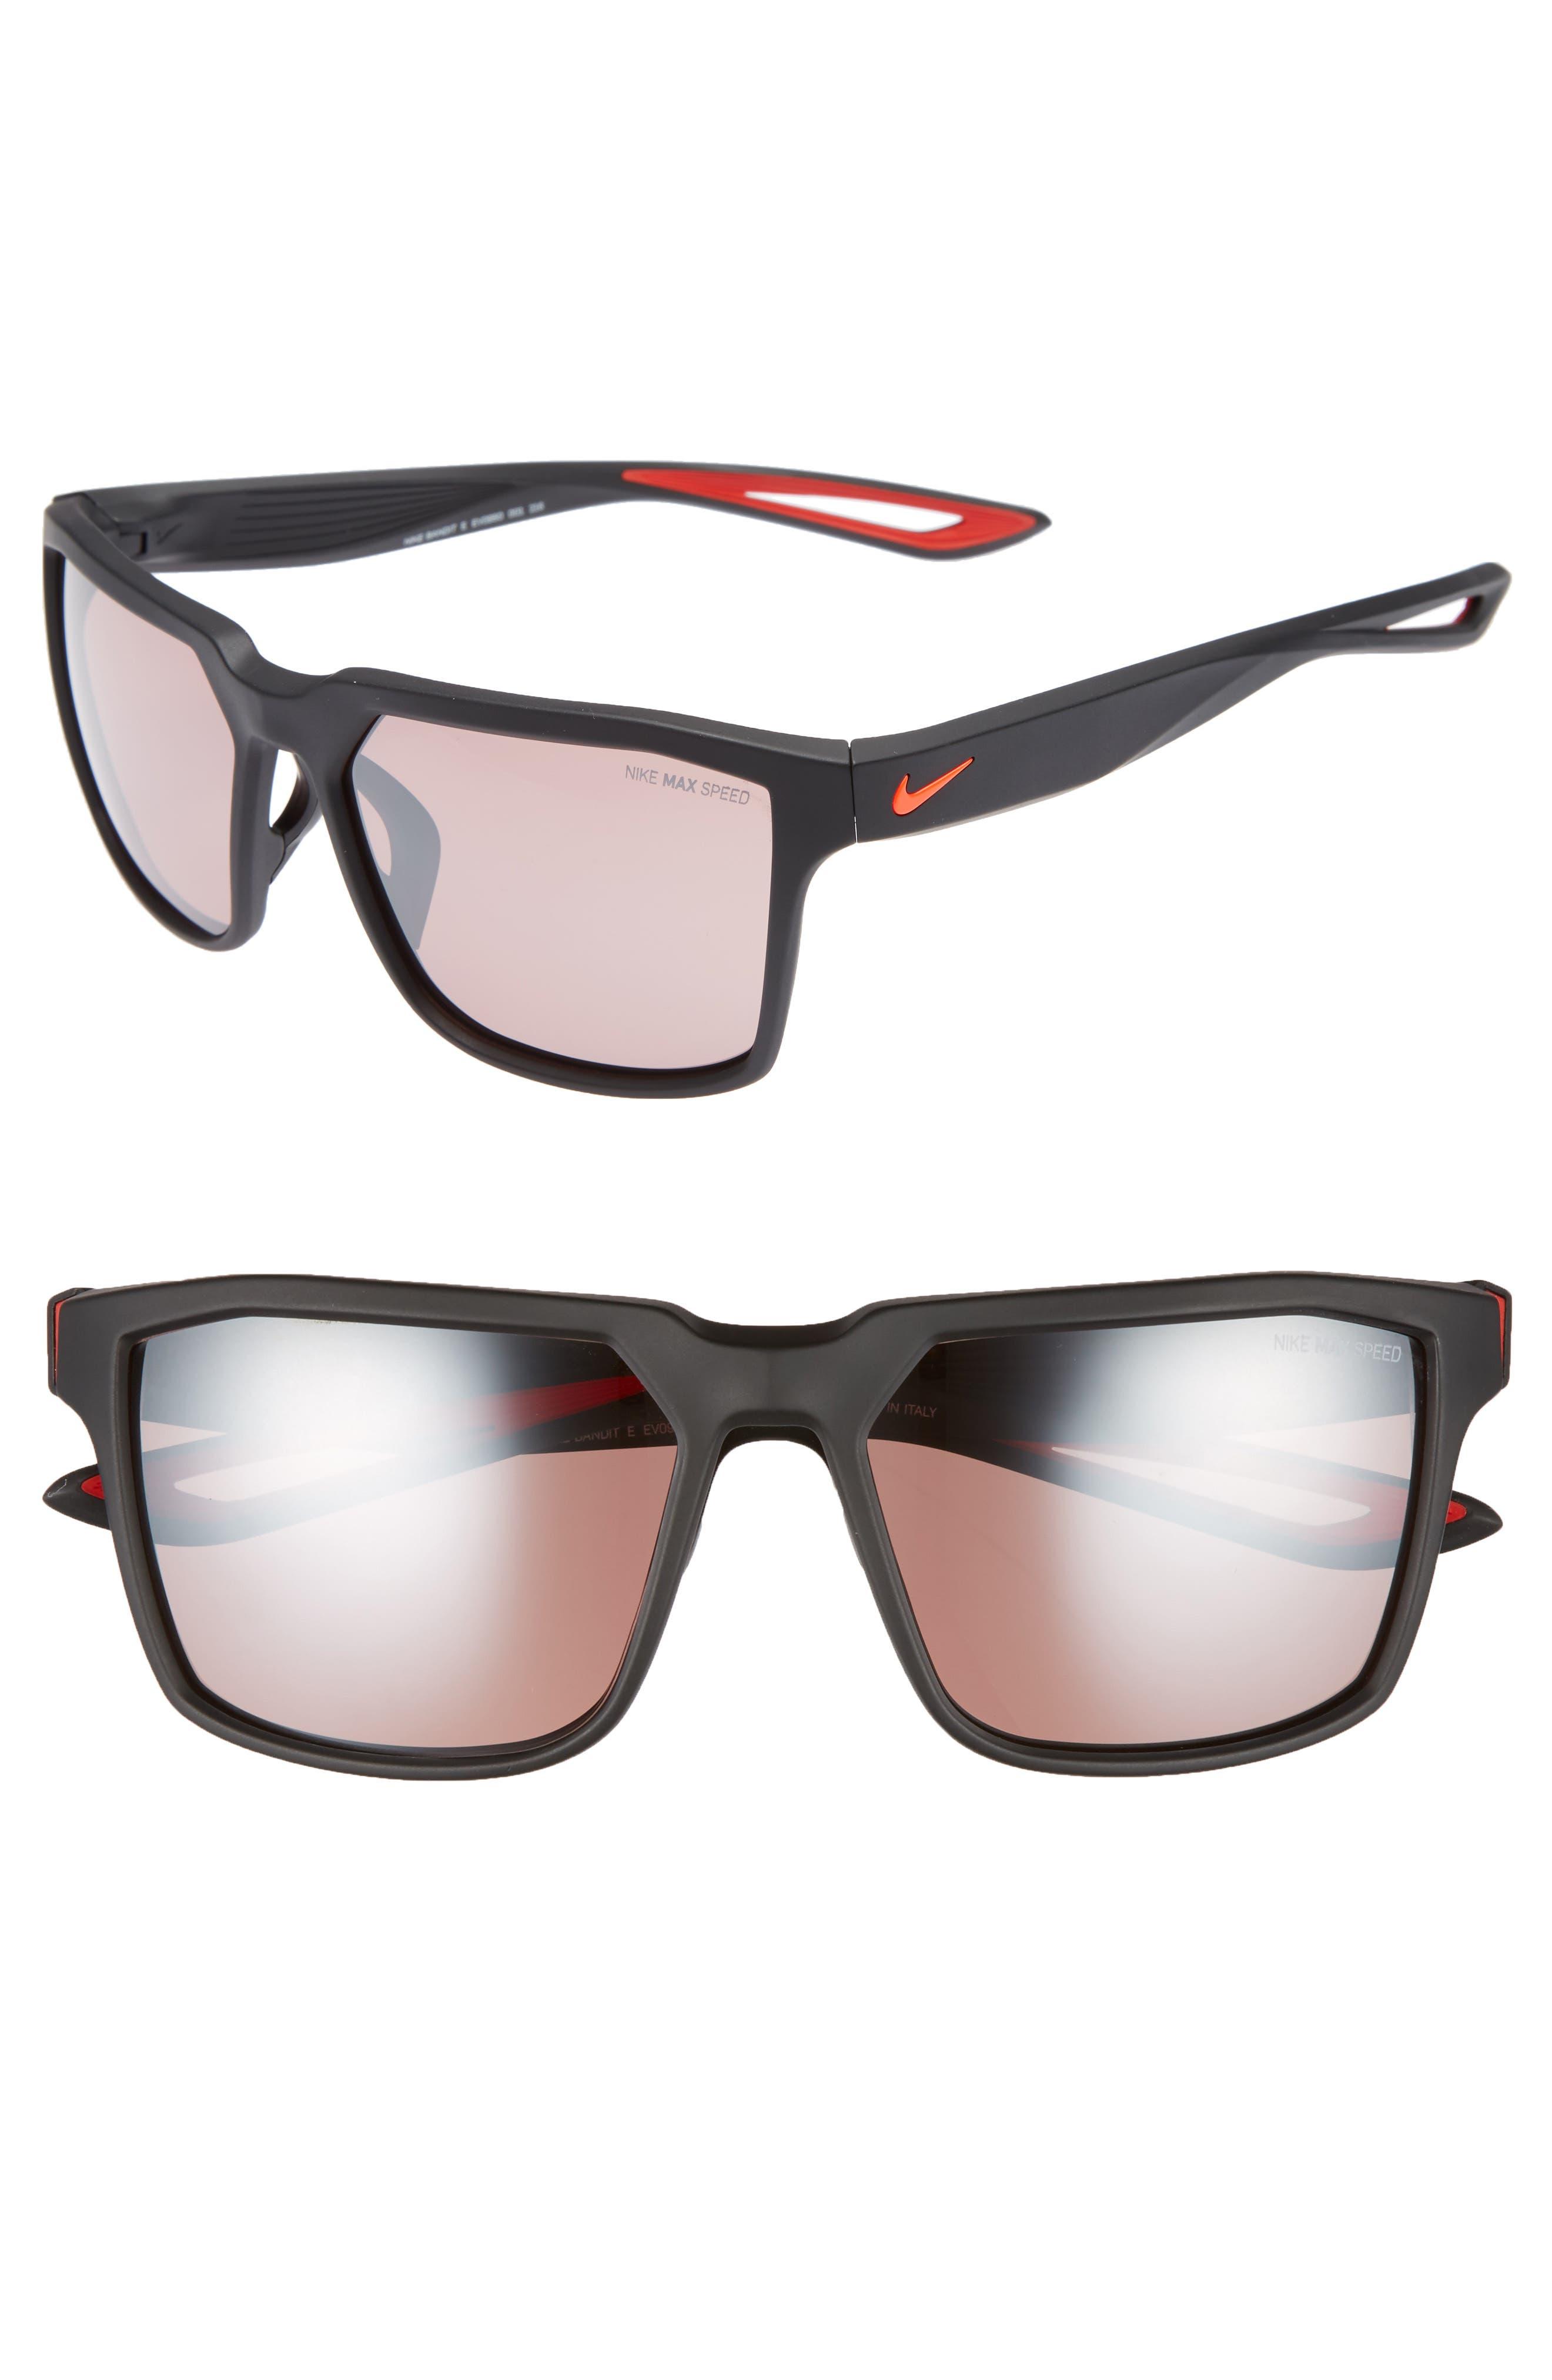 Nike Bandit E 59mm Running Sunglasses